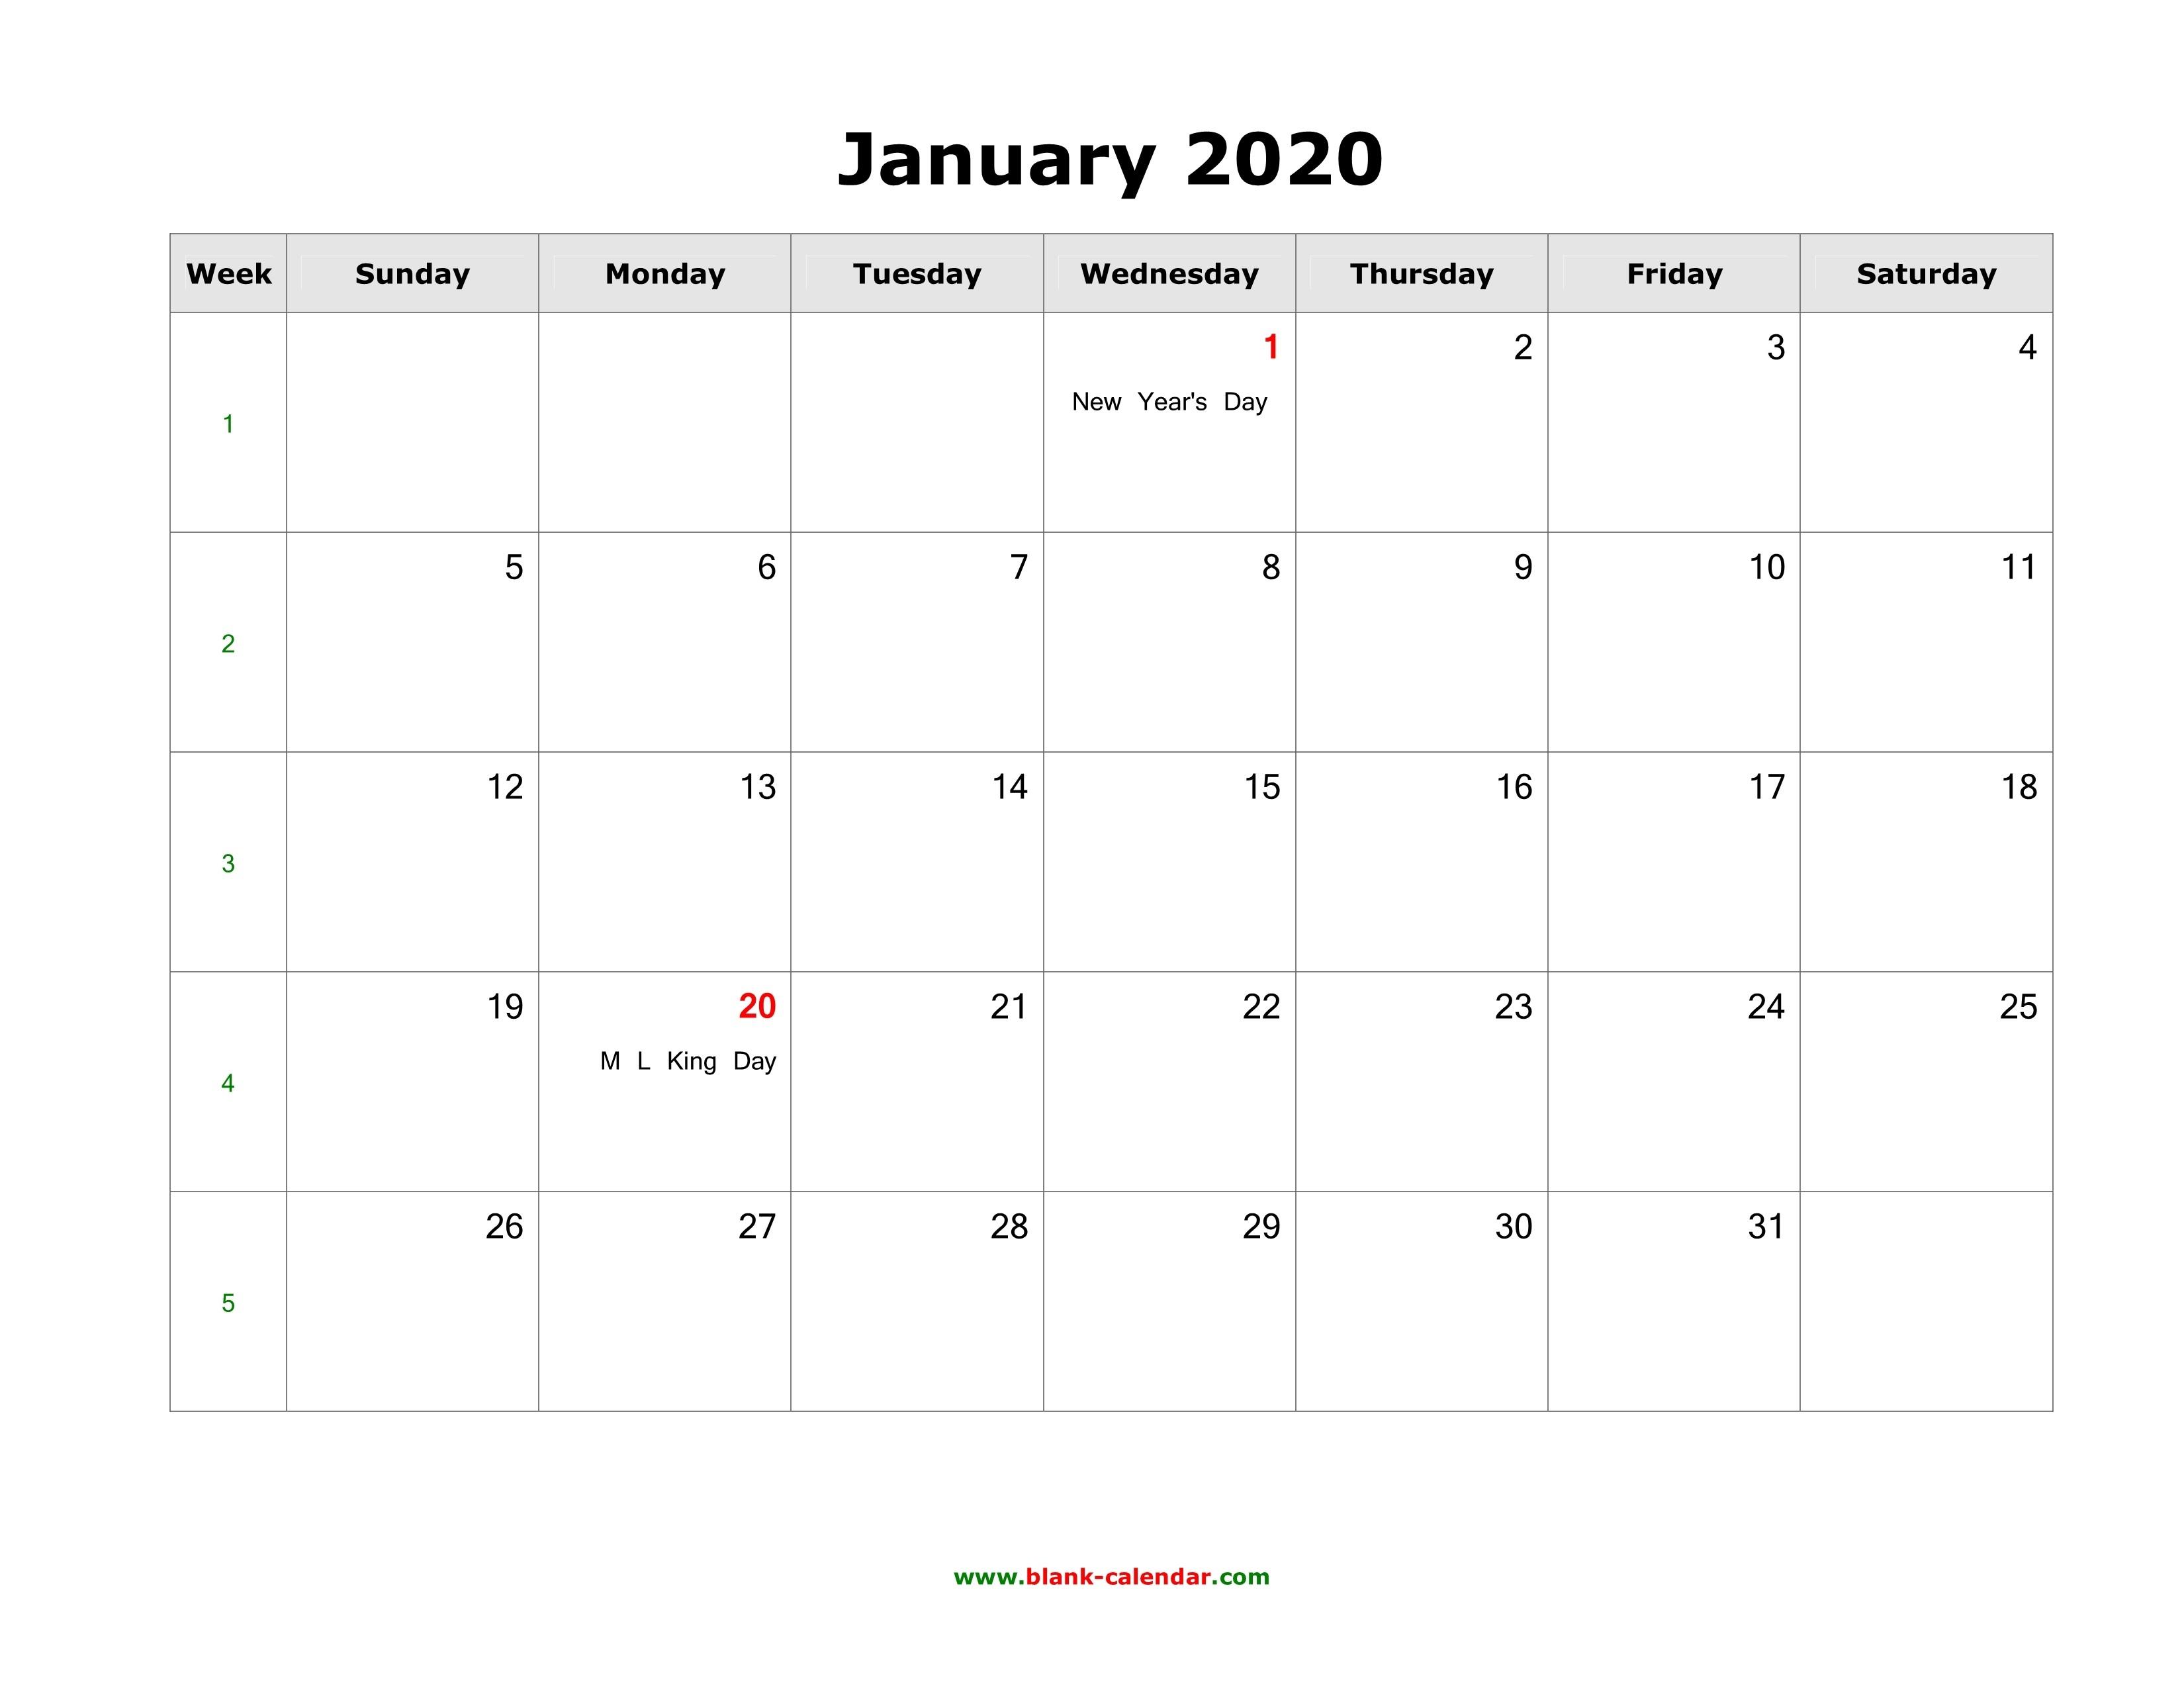 January 2020 Blank Calendar | Free Download Calendar Templates-January 2020 Calendar Microsoft Word